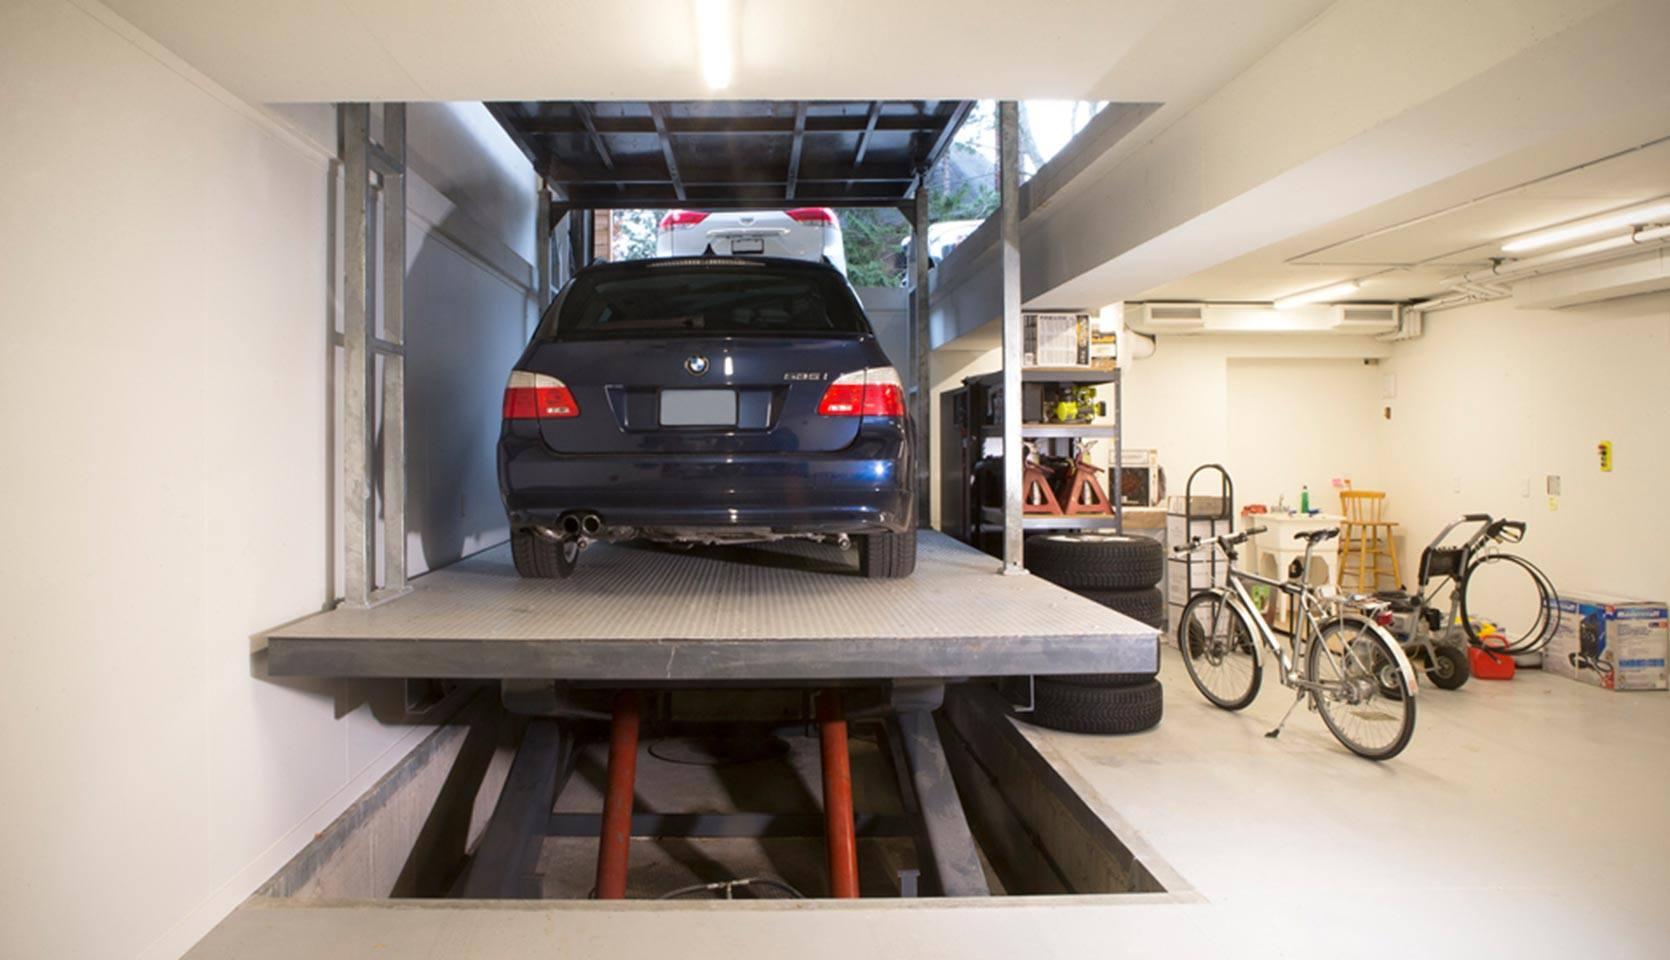 severnwoods-modern-rosedale-house-garage-with-car-lift